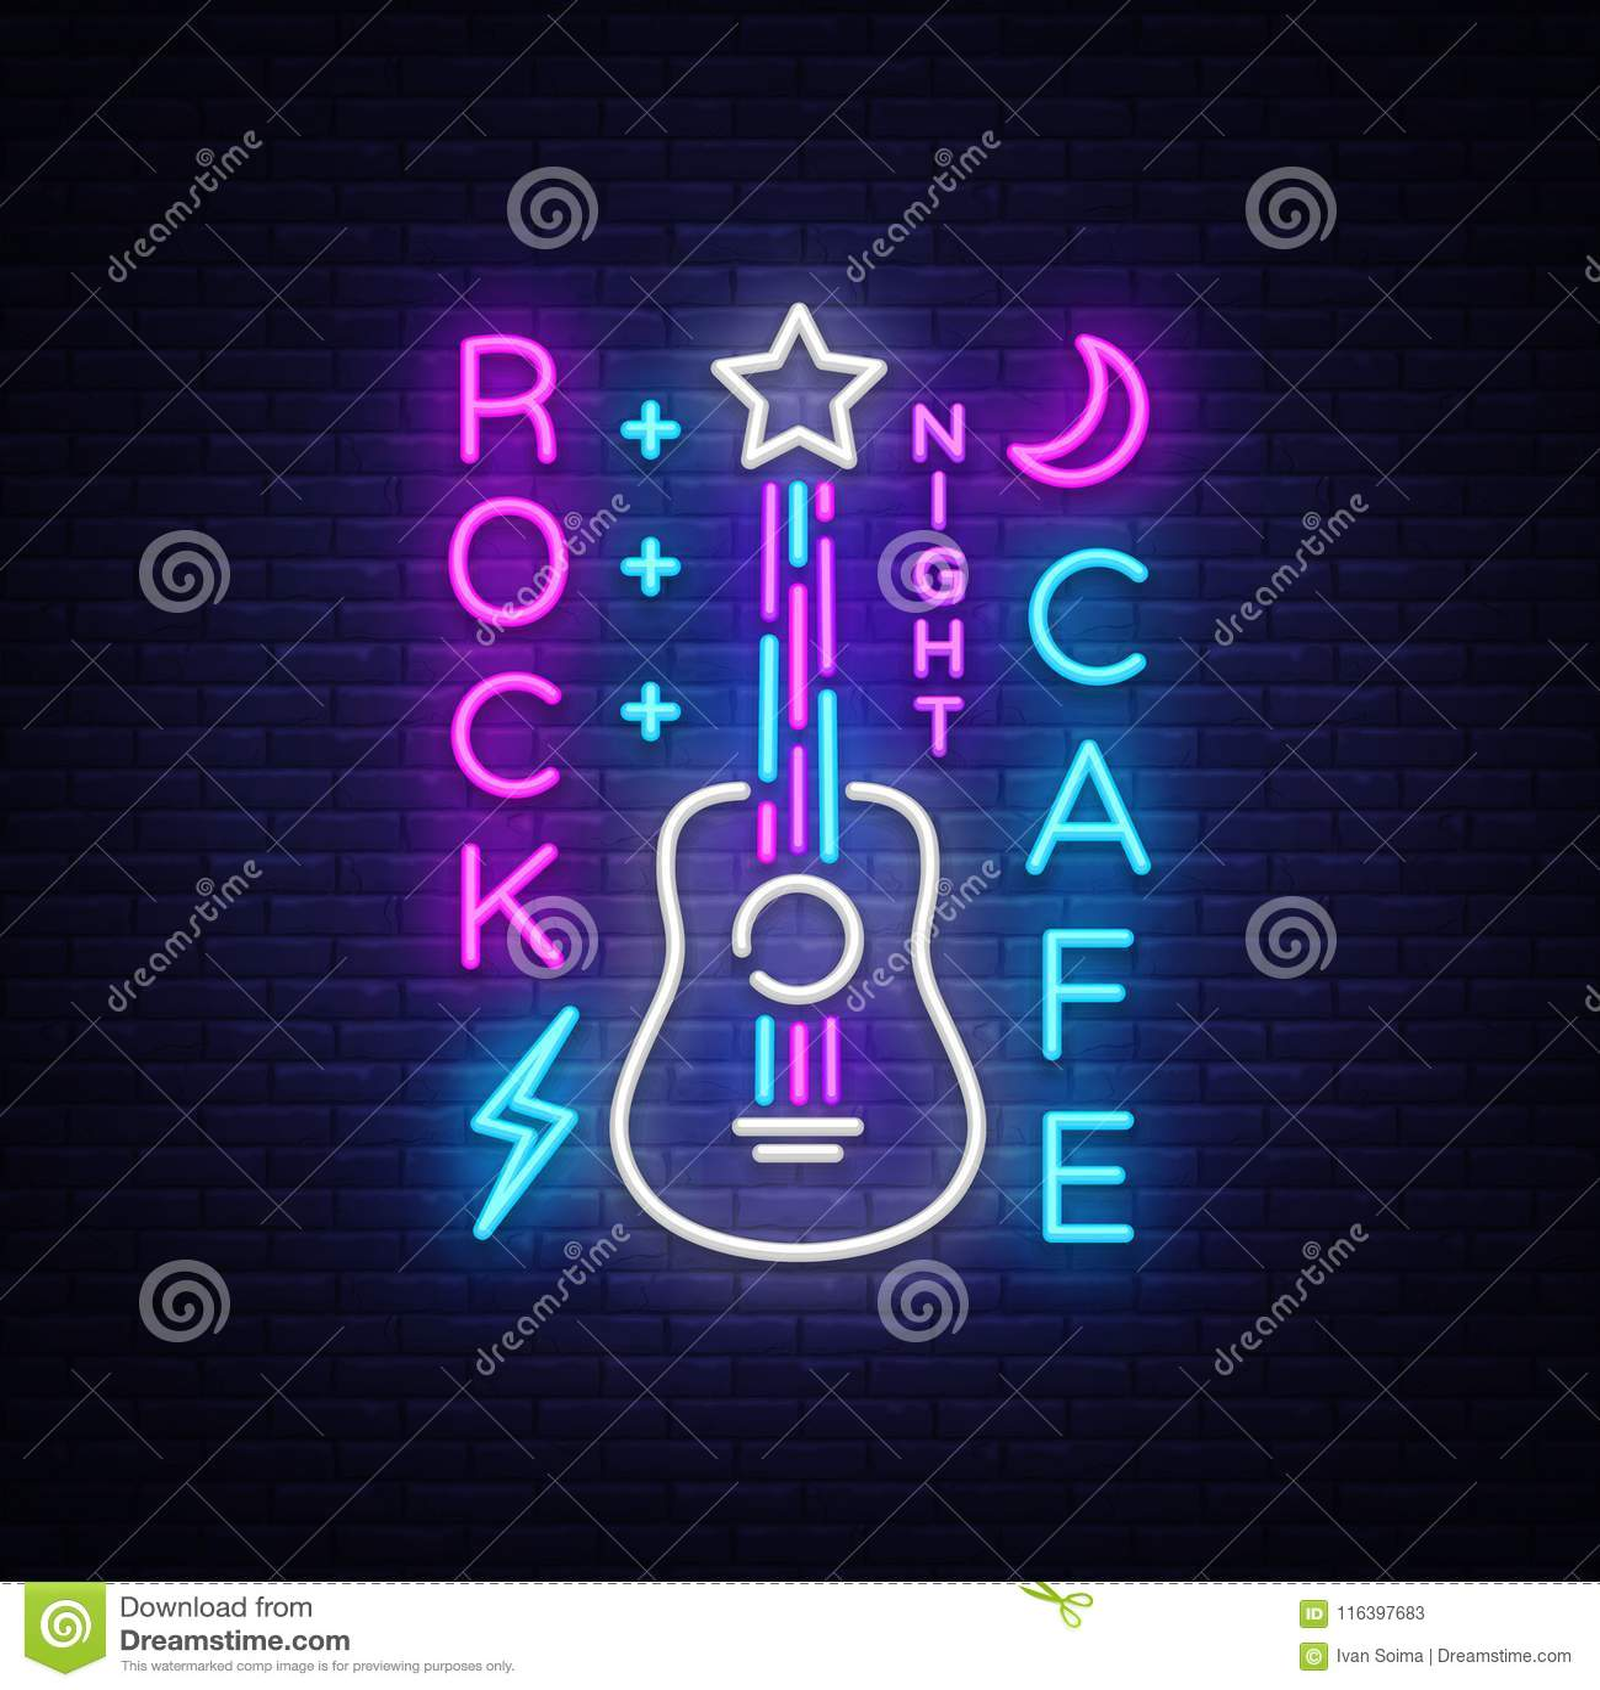 Felsen-Café Logo Neon Vector Schaukeln Sie Café-Leuchtreklame, Konzept mit Gitarre, helle Nachtwerbung, helle Fahne, Live Music